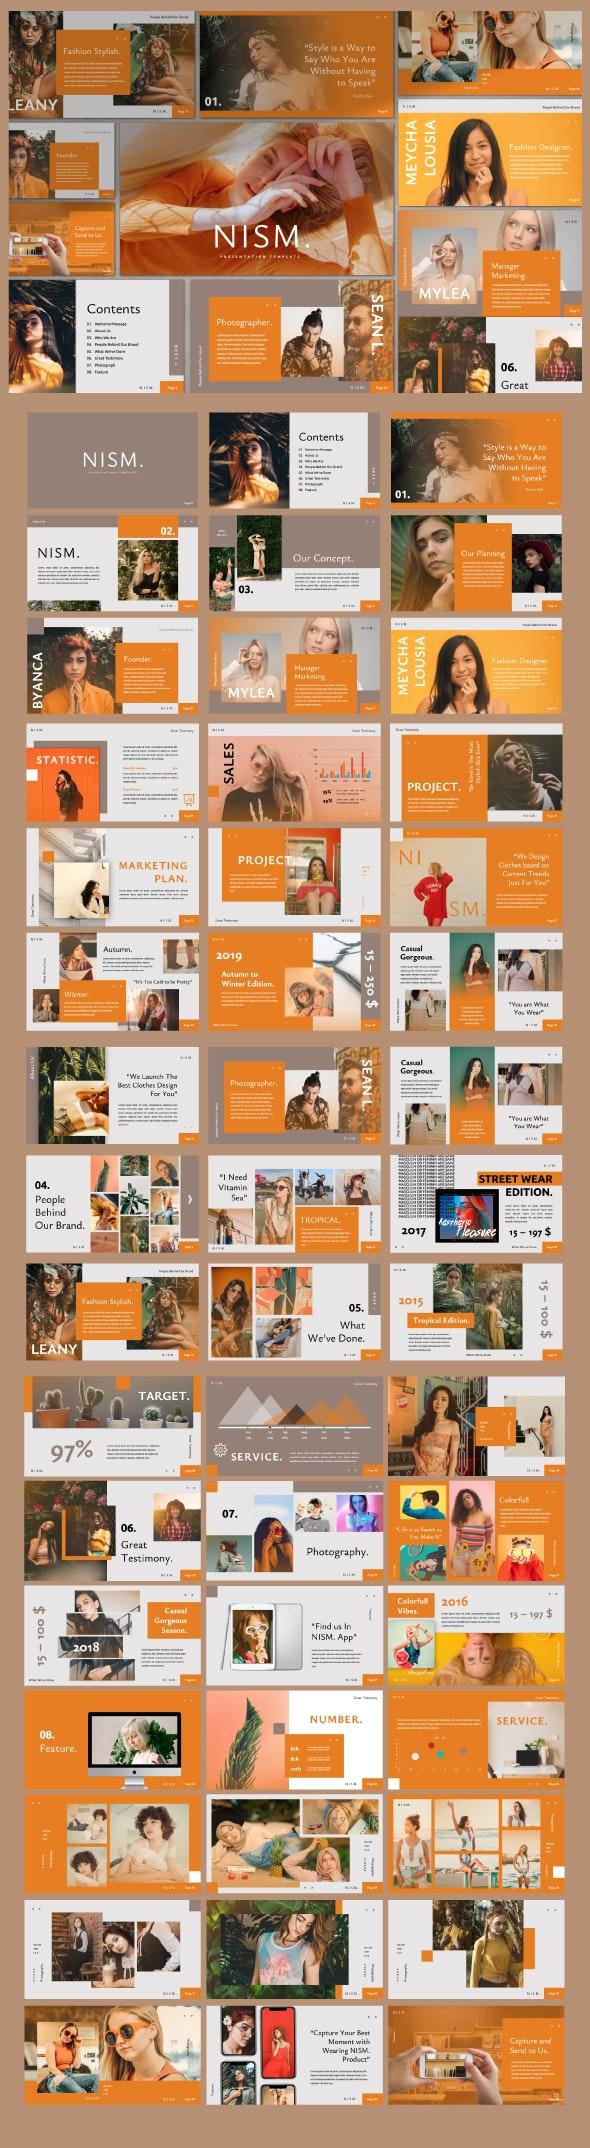 Nism. Brand Sheet Keynote - Creative Keynote Templates